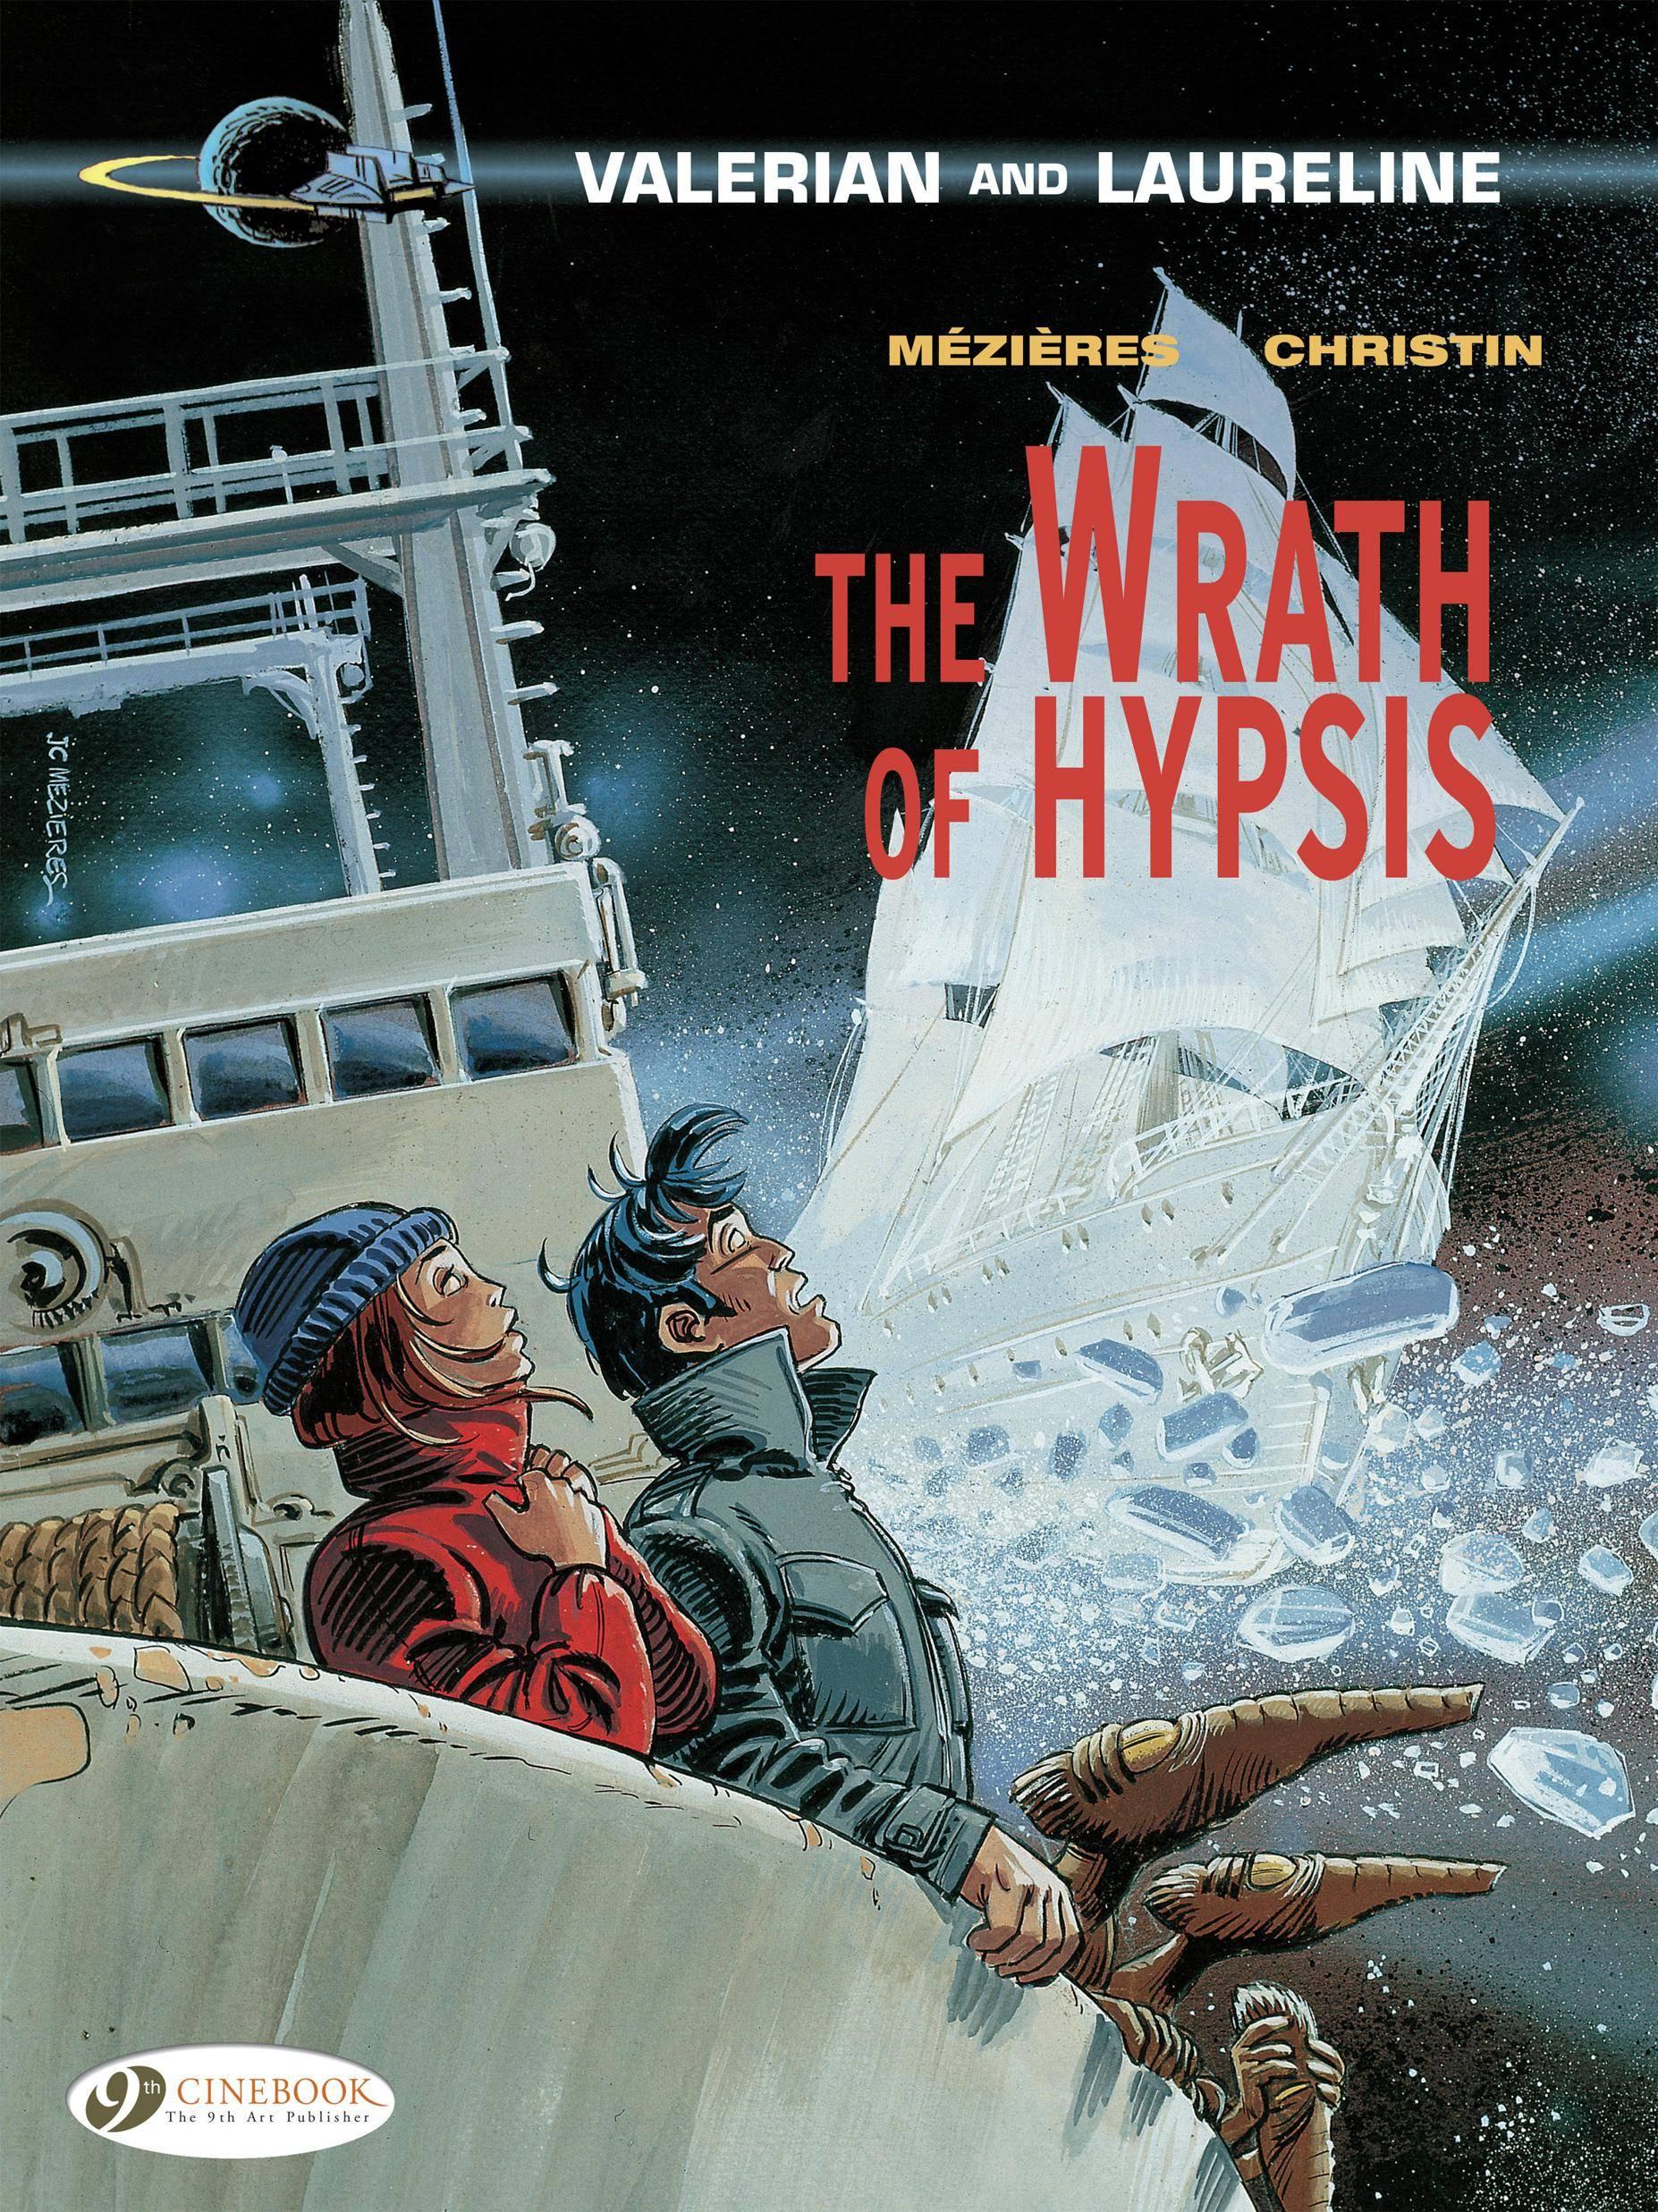 Valerian and Laureline v12 - The Wrath of Hypsis 2016